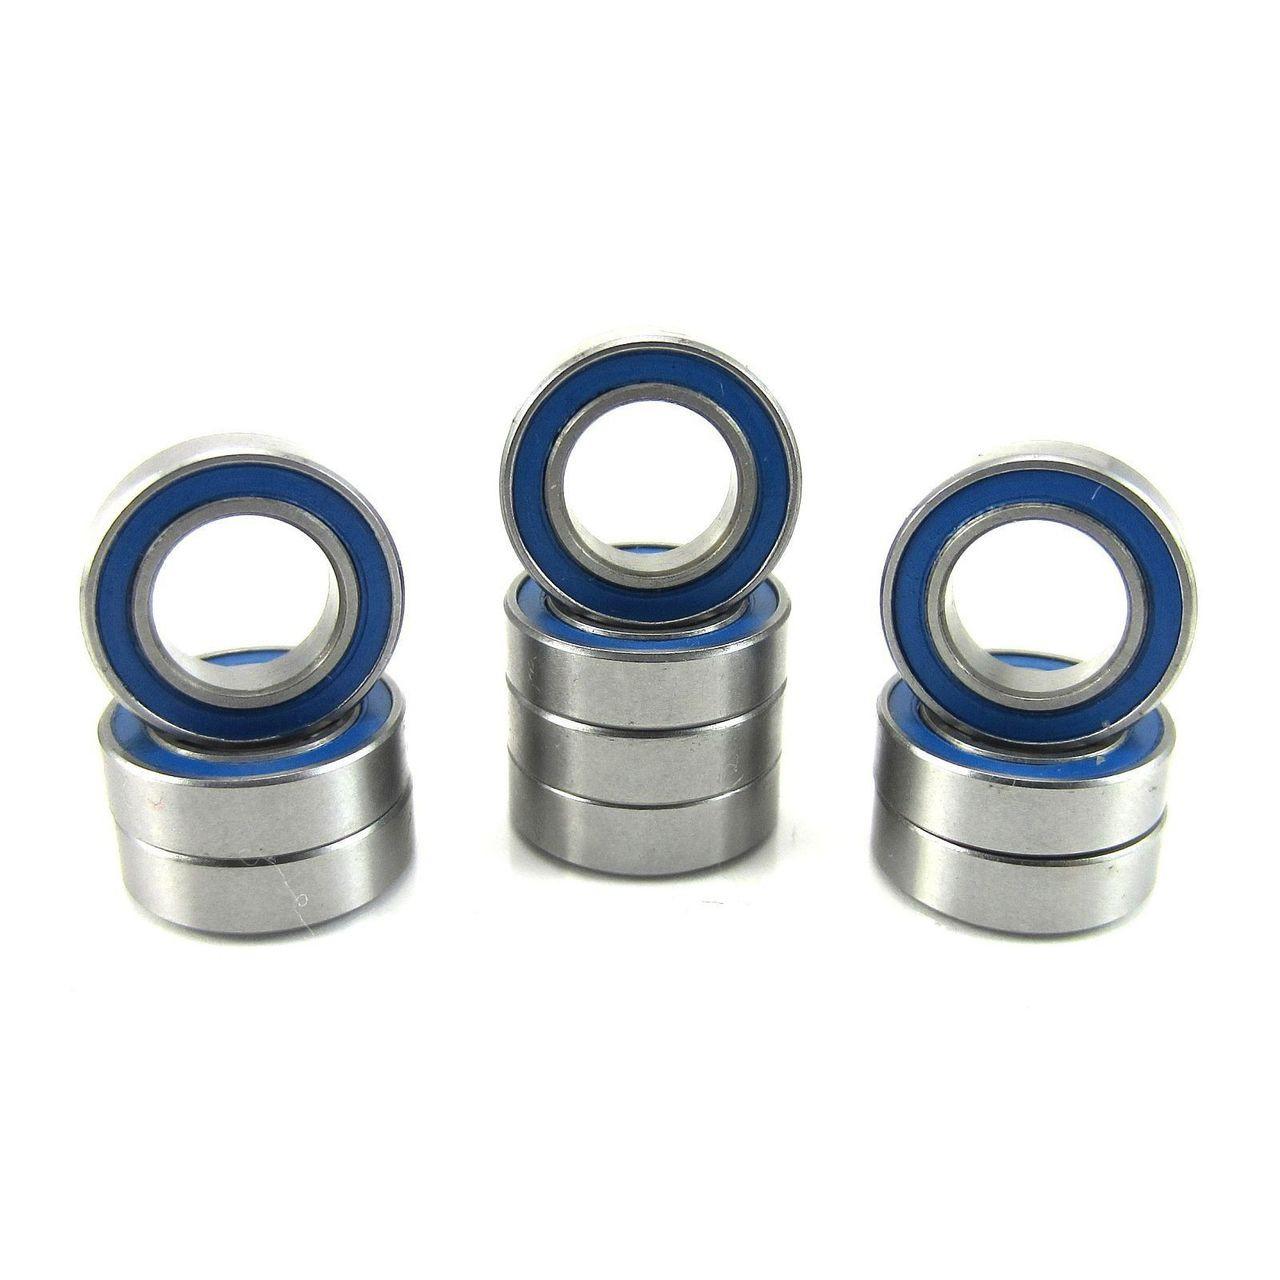 TRB RC 8x14x4mm Precision Ball Bearings ABEC 3 Rubber Sealed BLU (10)